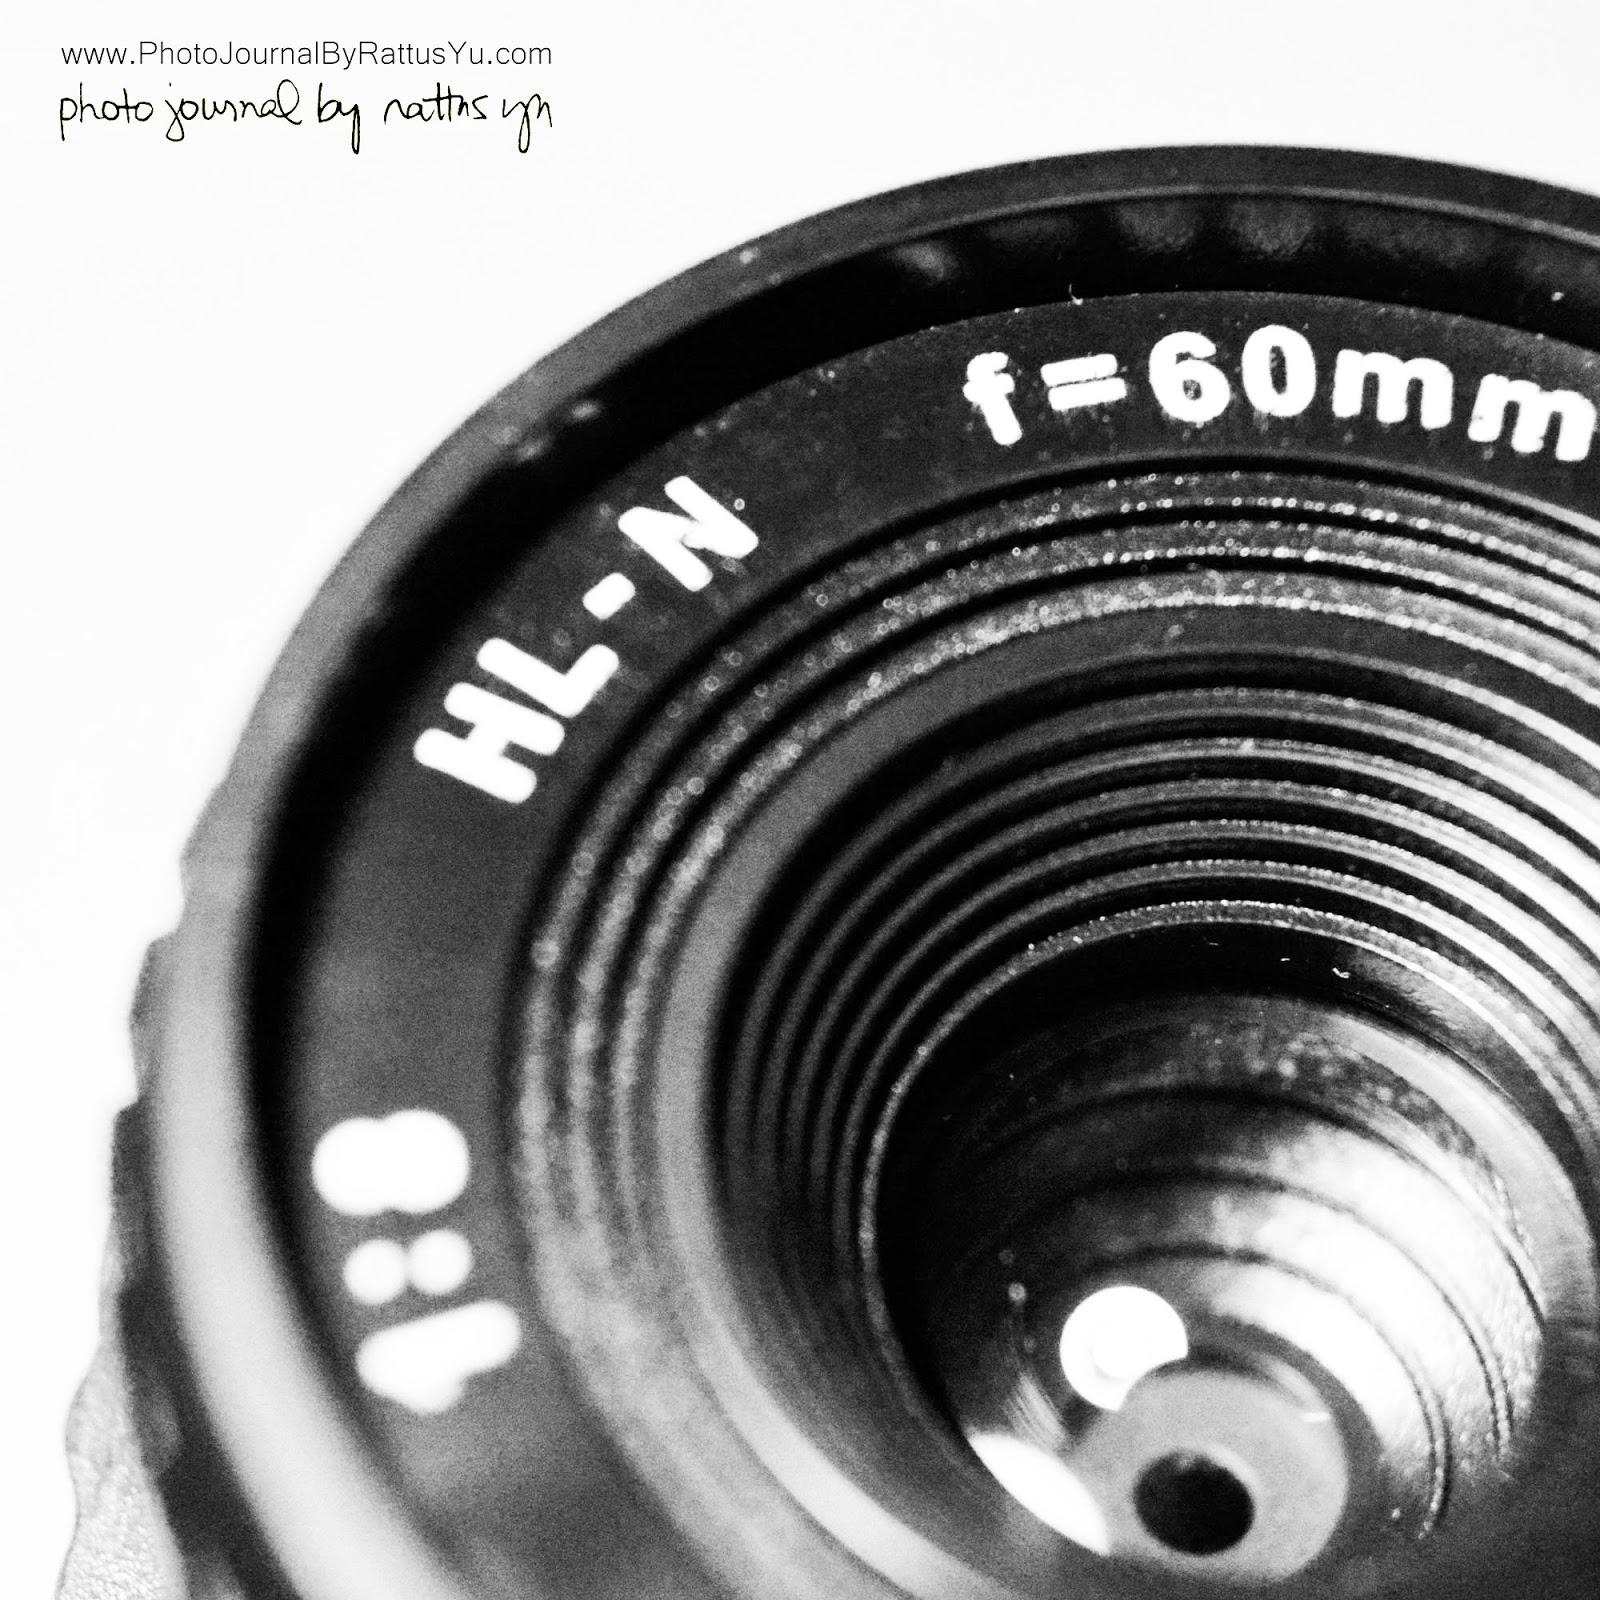 Holga HL-N 60mm f/8 for Nikon (Medium Format Lens, 165mm f/22 on APS-C!)